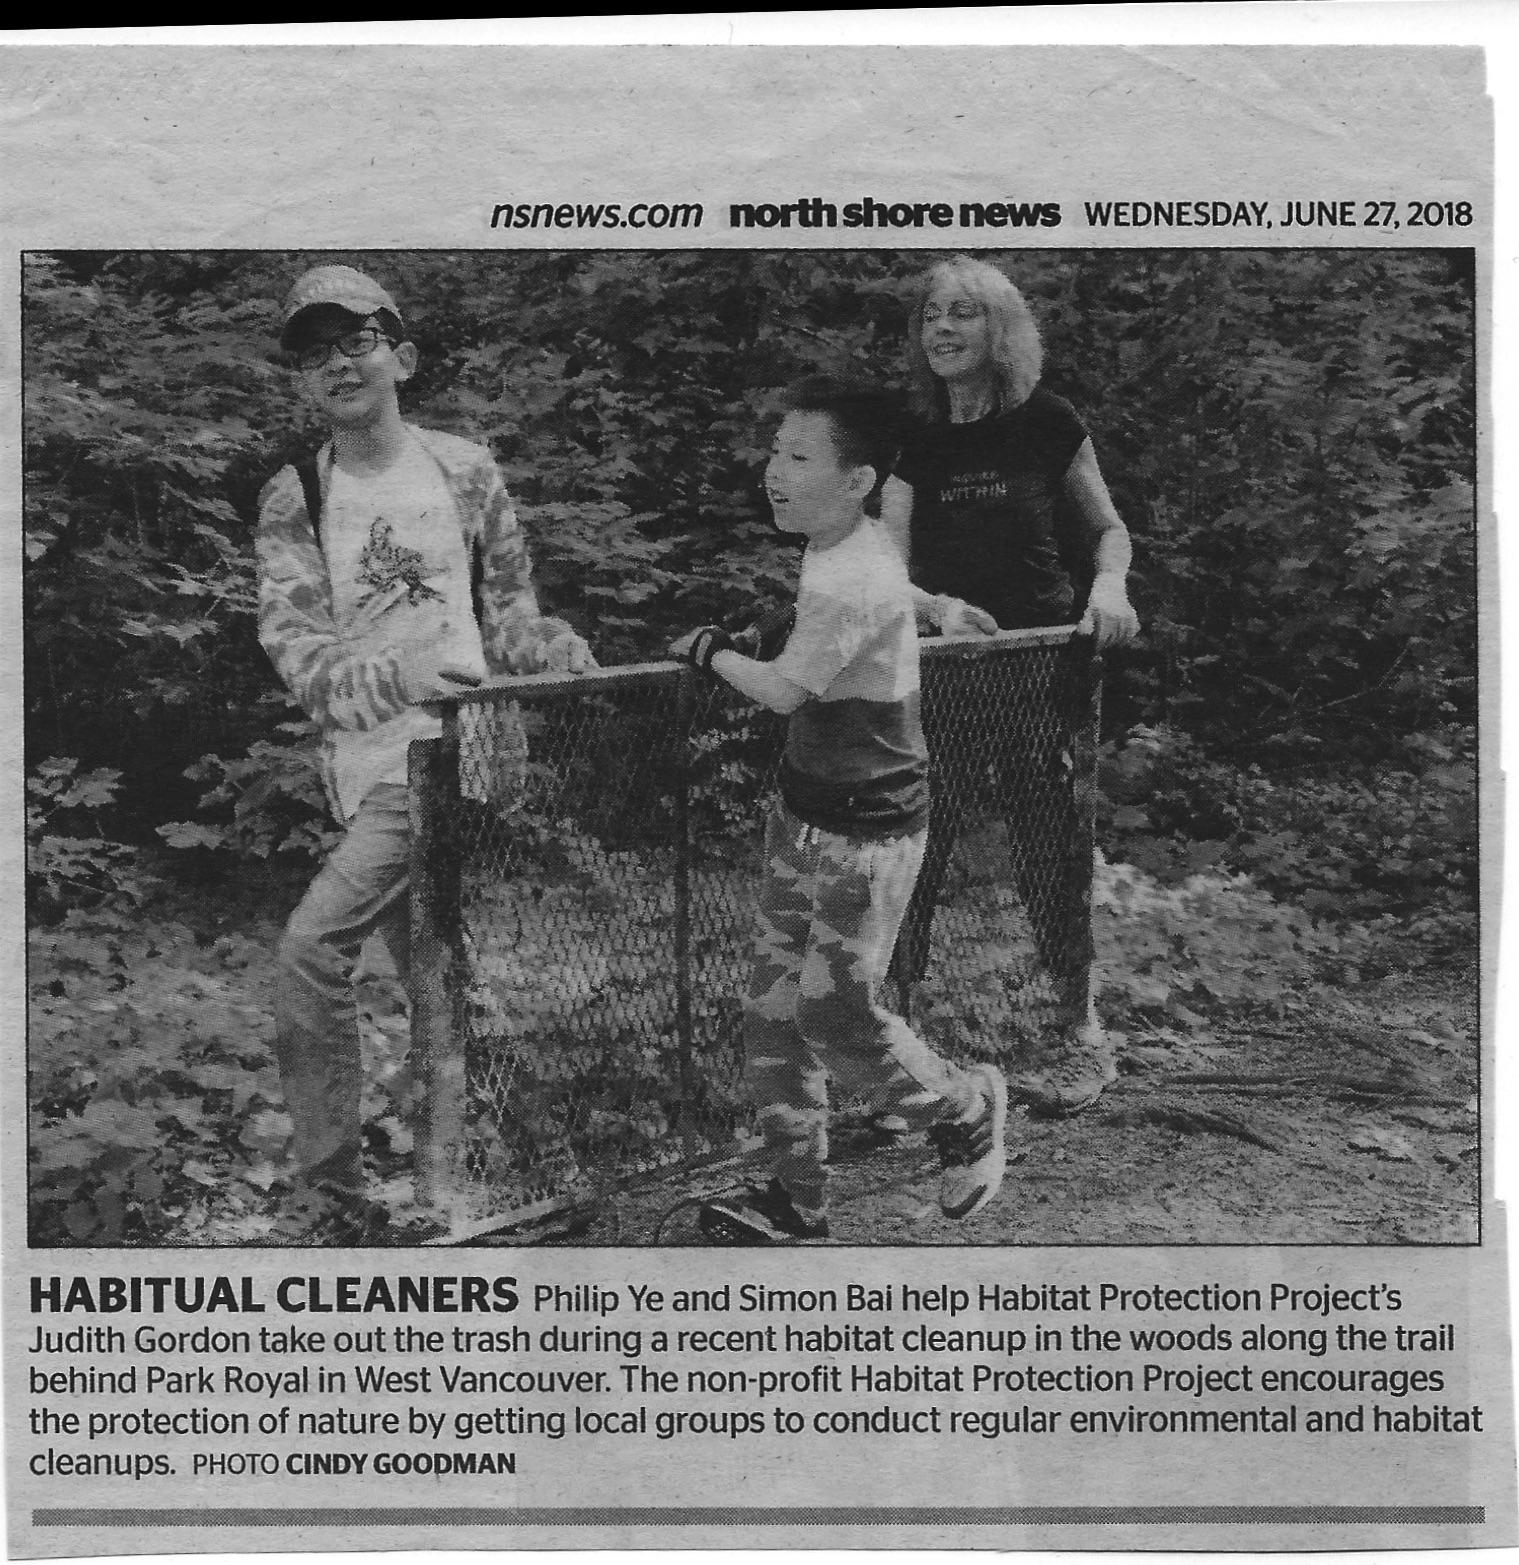 News_Habitual_Cleaners.jpg